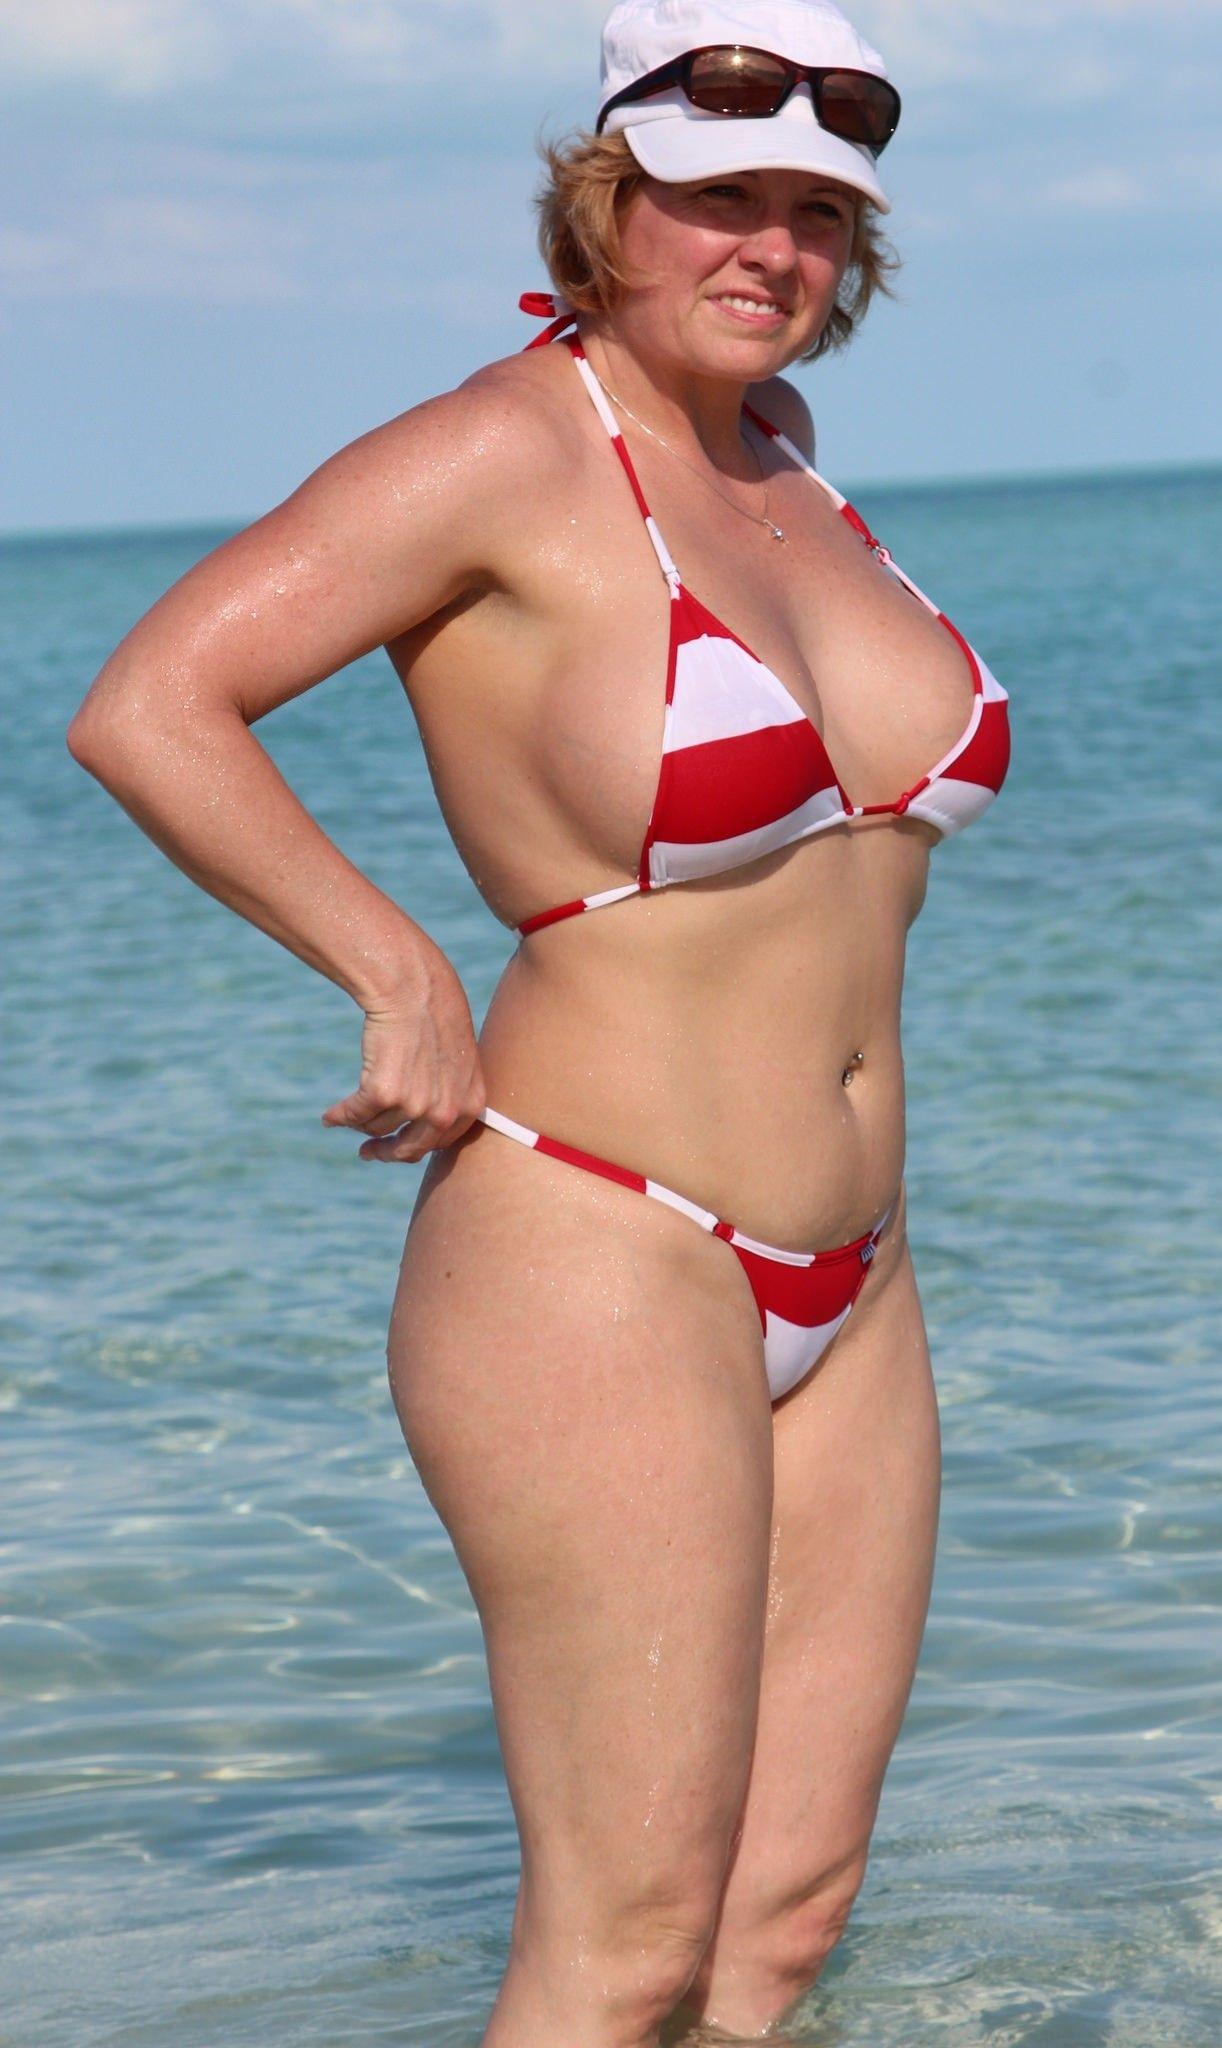 Great Posture  Swim  Bikini Girls, Bikinis, Sexy Older -6517